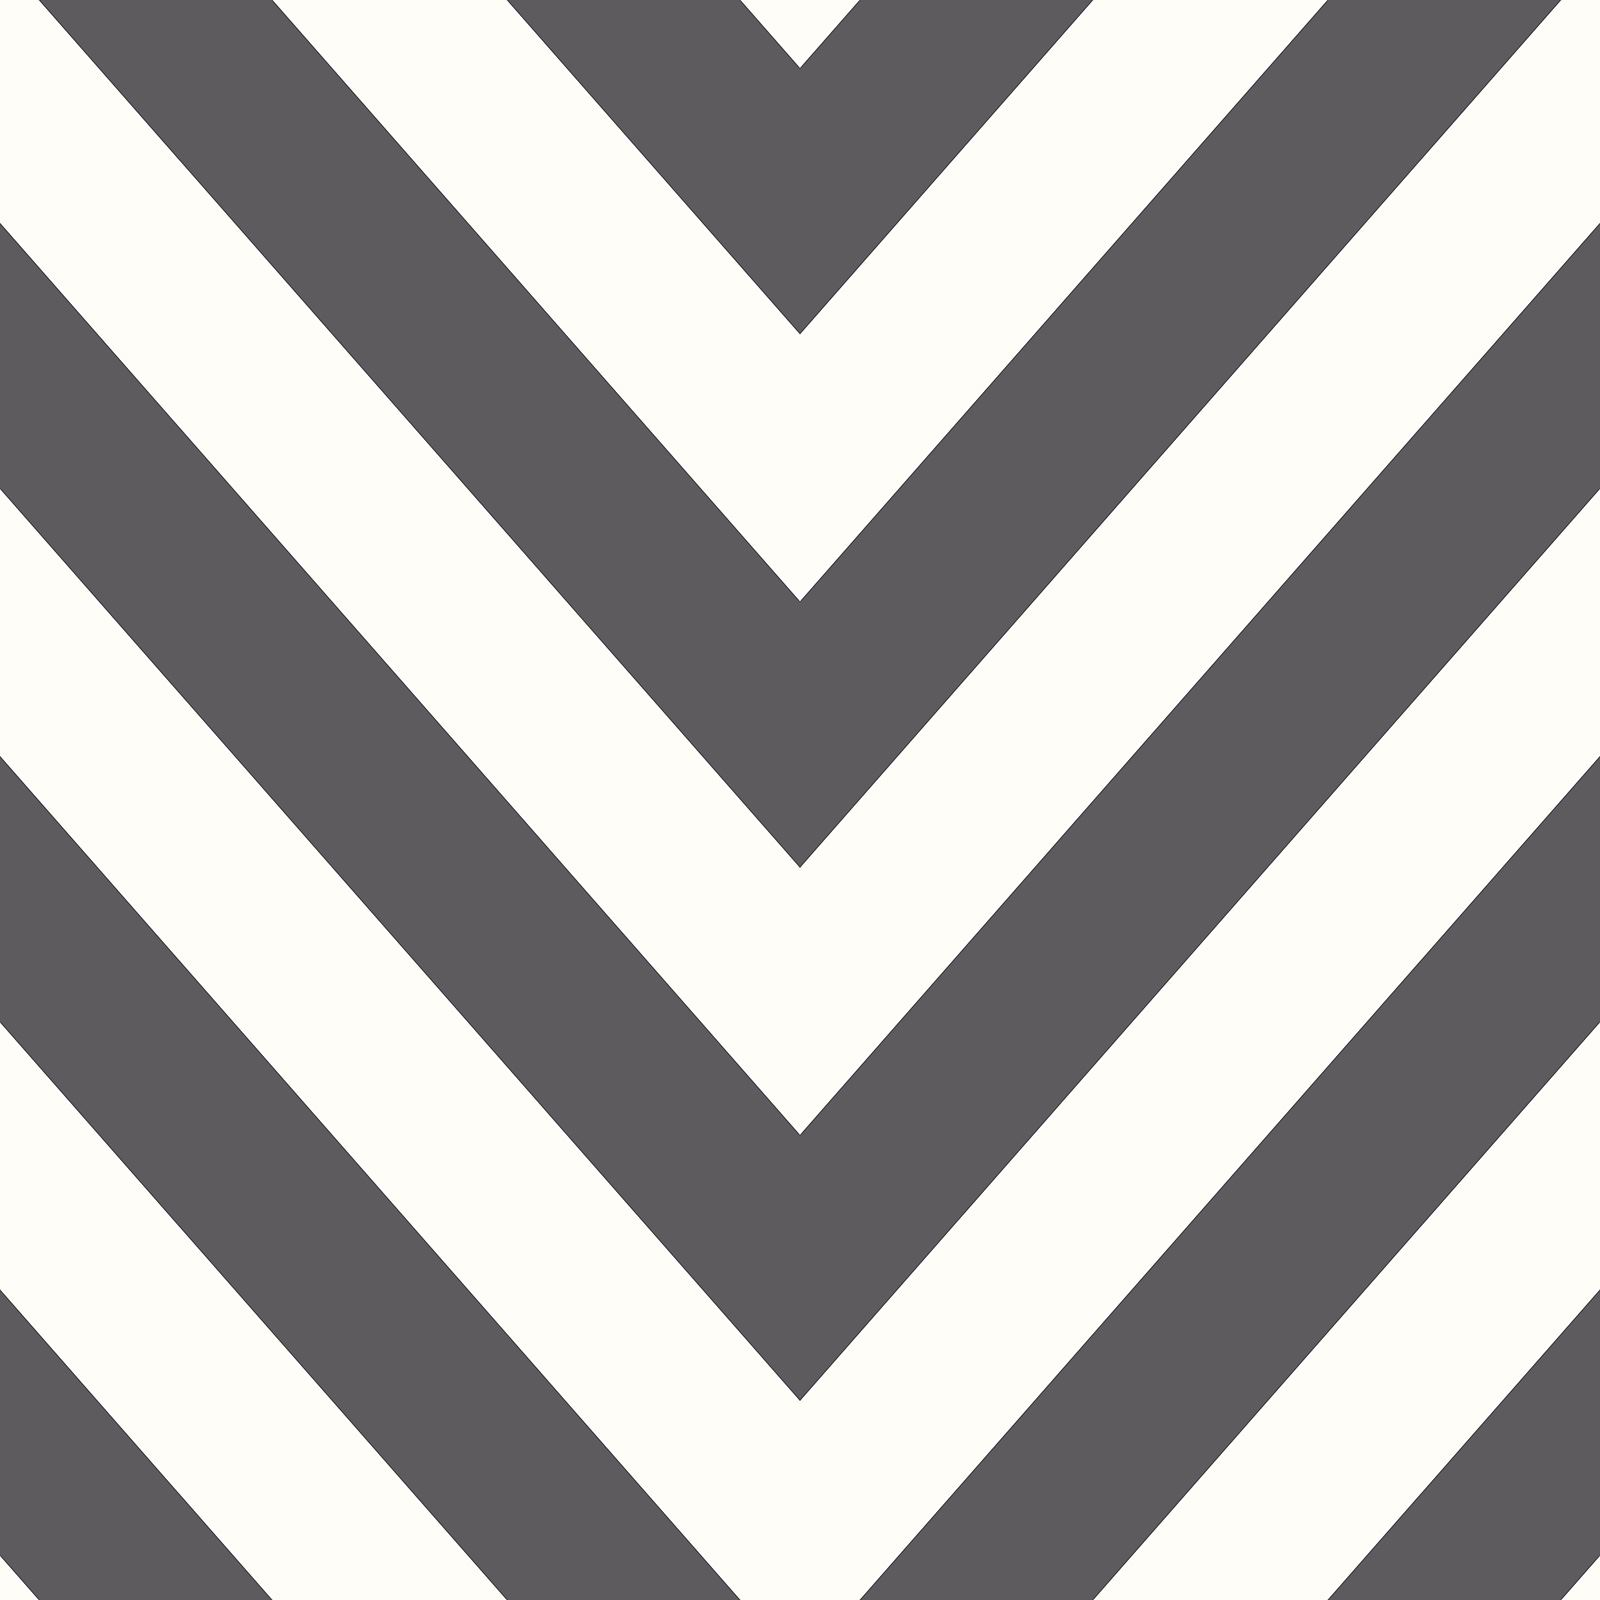 Details About Chevron Zig Zag Wallpaper Black White Holden Decor 12574 New